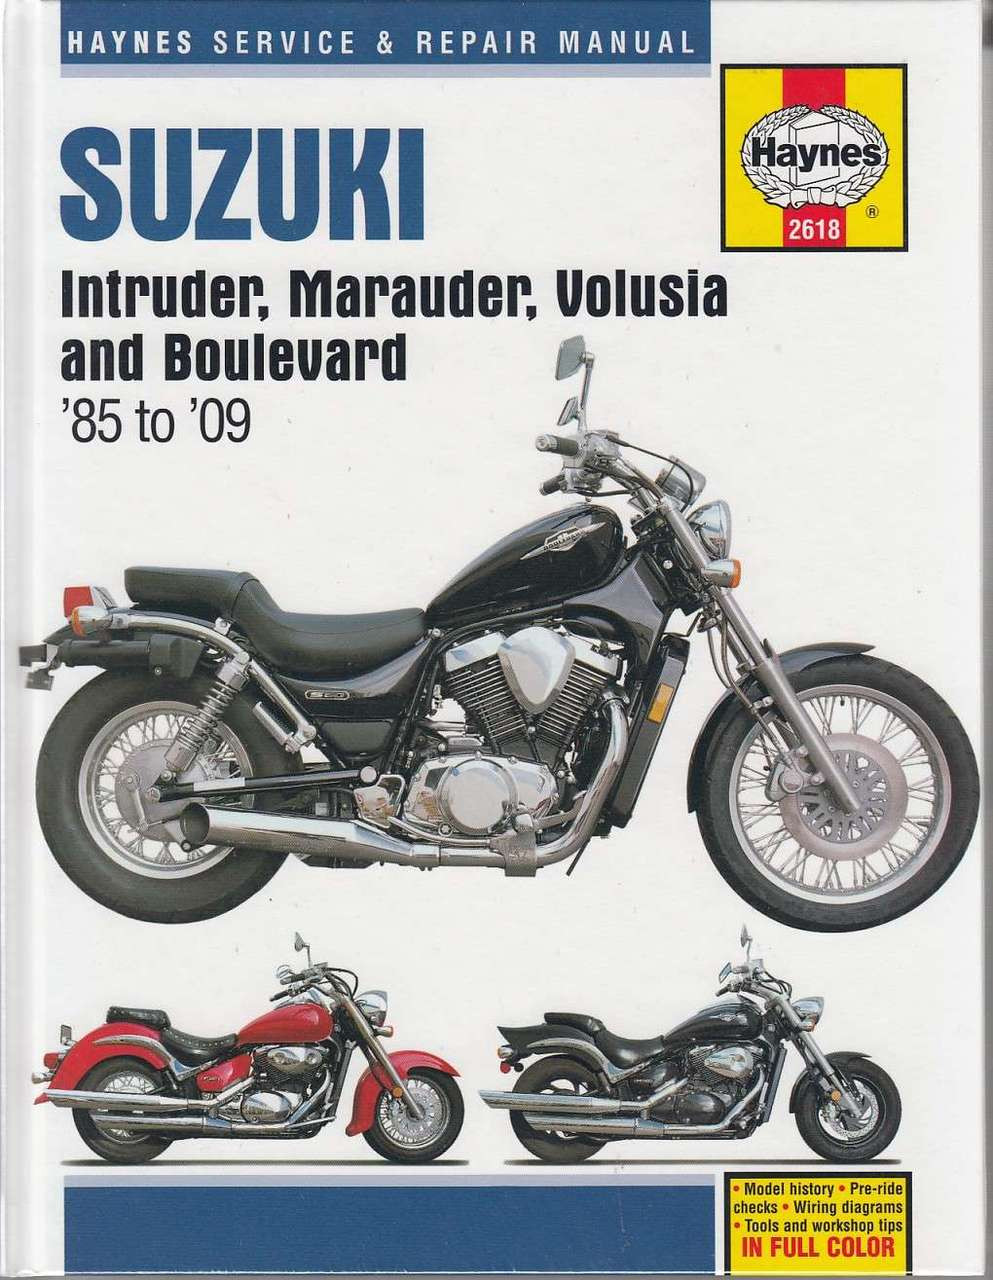 [DIAGRAM_5FD]  591 Suzuki M50 Diagram - Starting Know About Wiring Diagram • | Wiring  Library | 2009 Suzuki M50 Wiring Diagram |  | Wiring Library